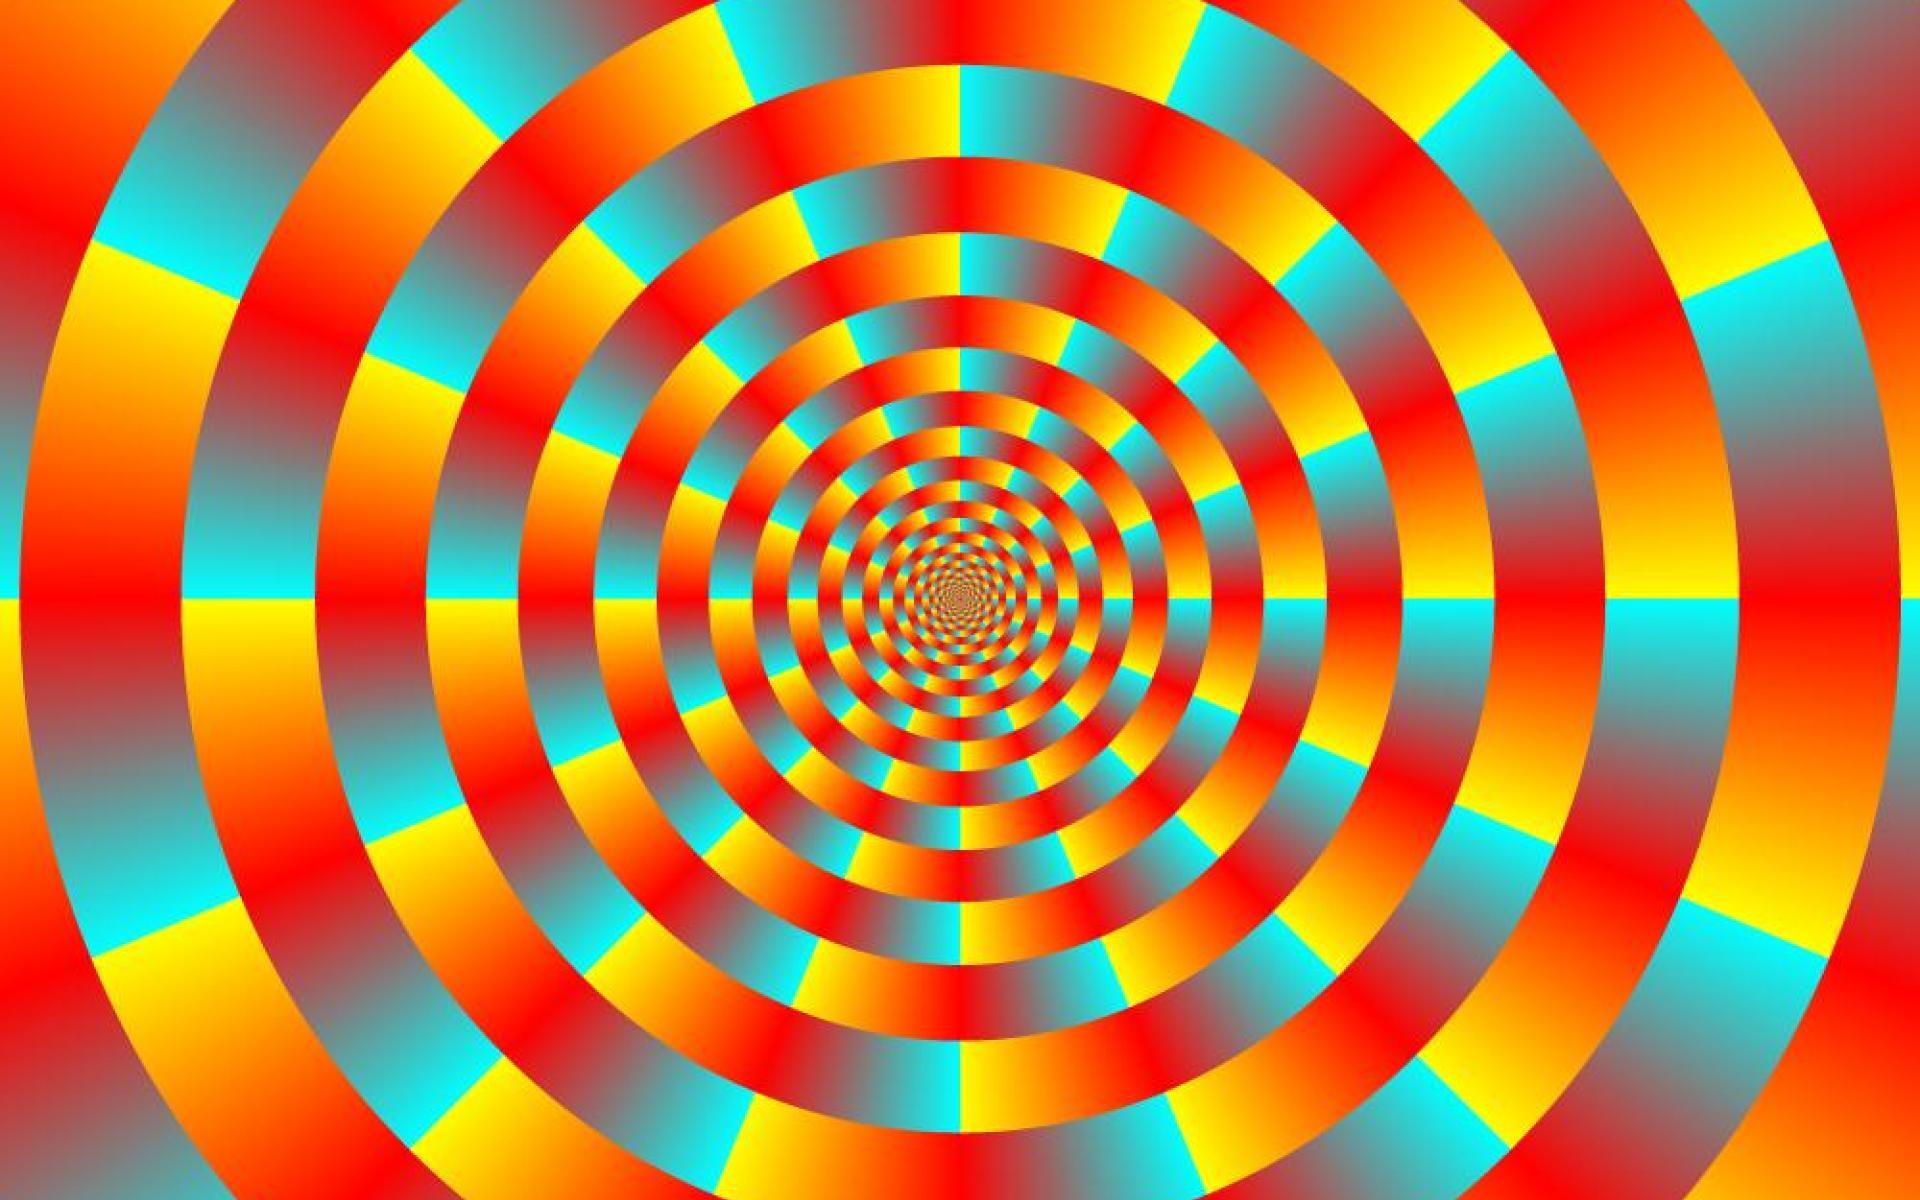 Funky Illusion Illusions Wallpaper 40457474 Fanpop